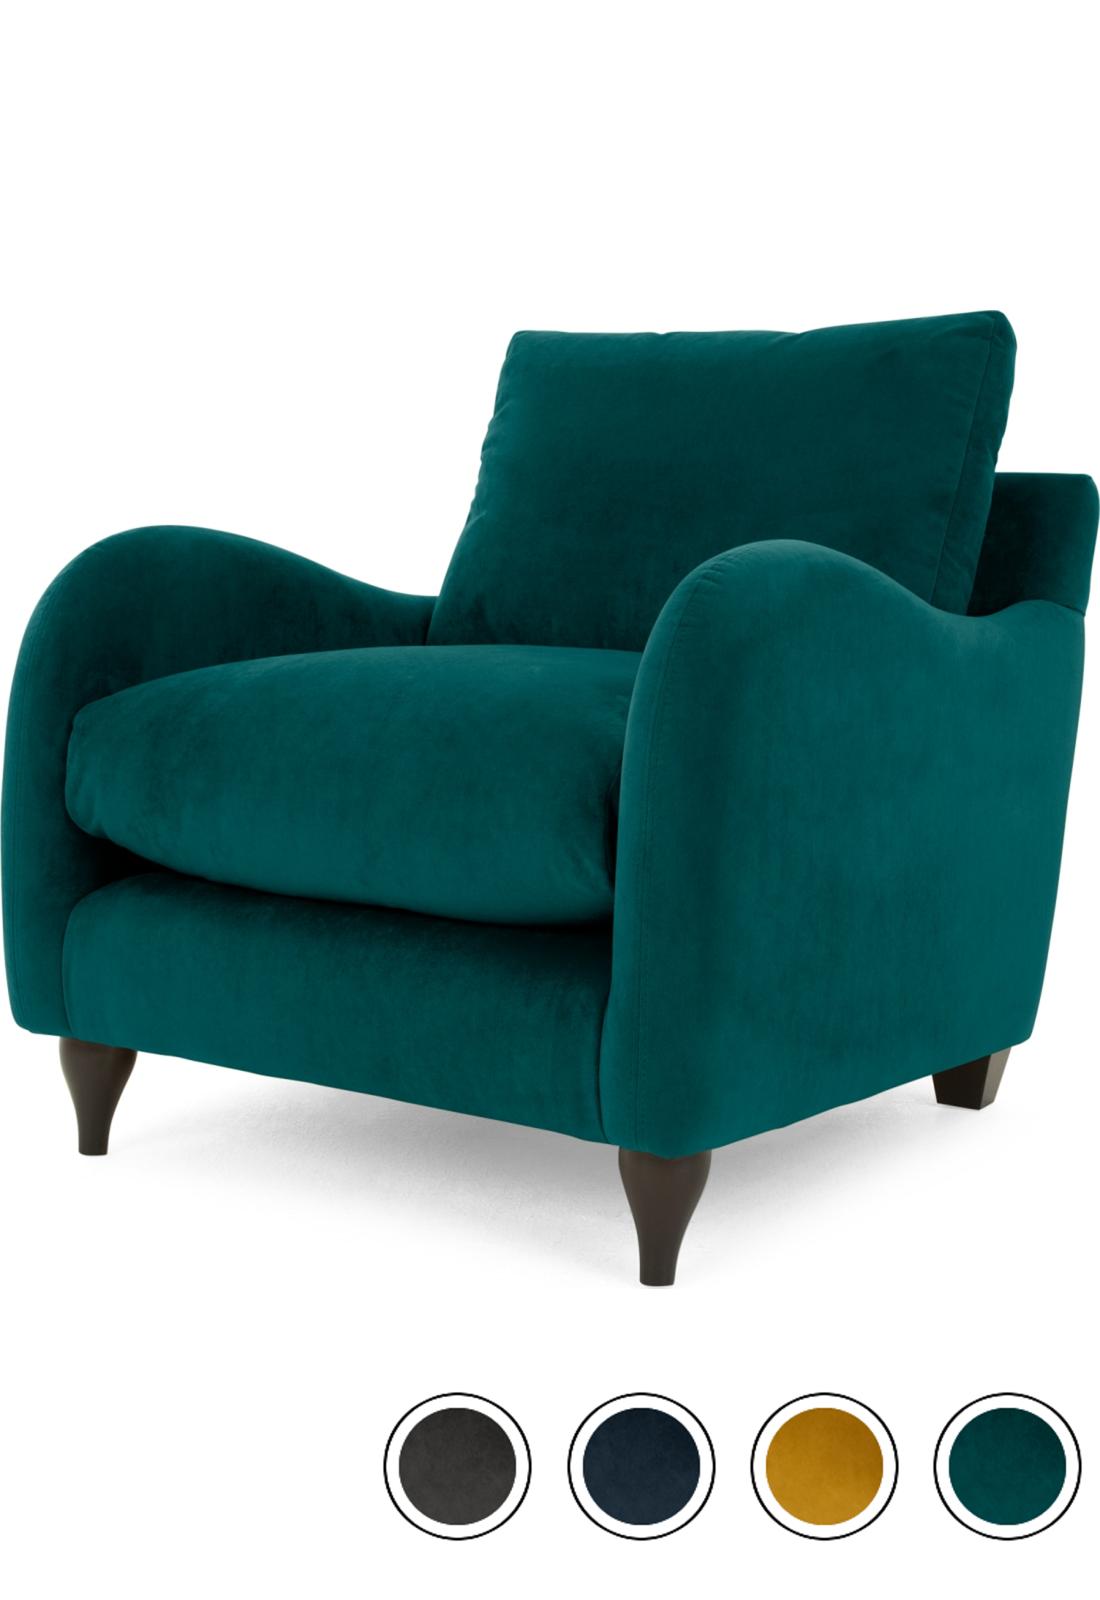 MADE Plush Mallard Velvet Armchair   Armchair, Teal ...